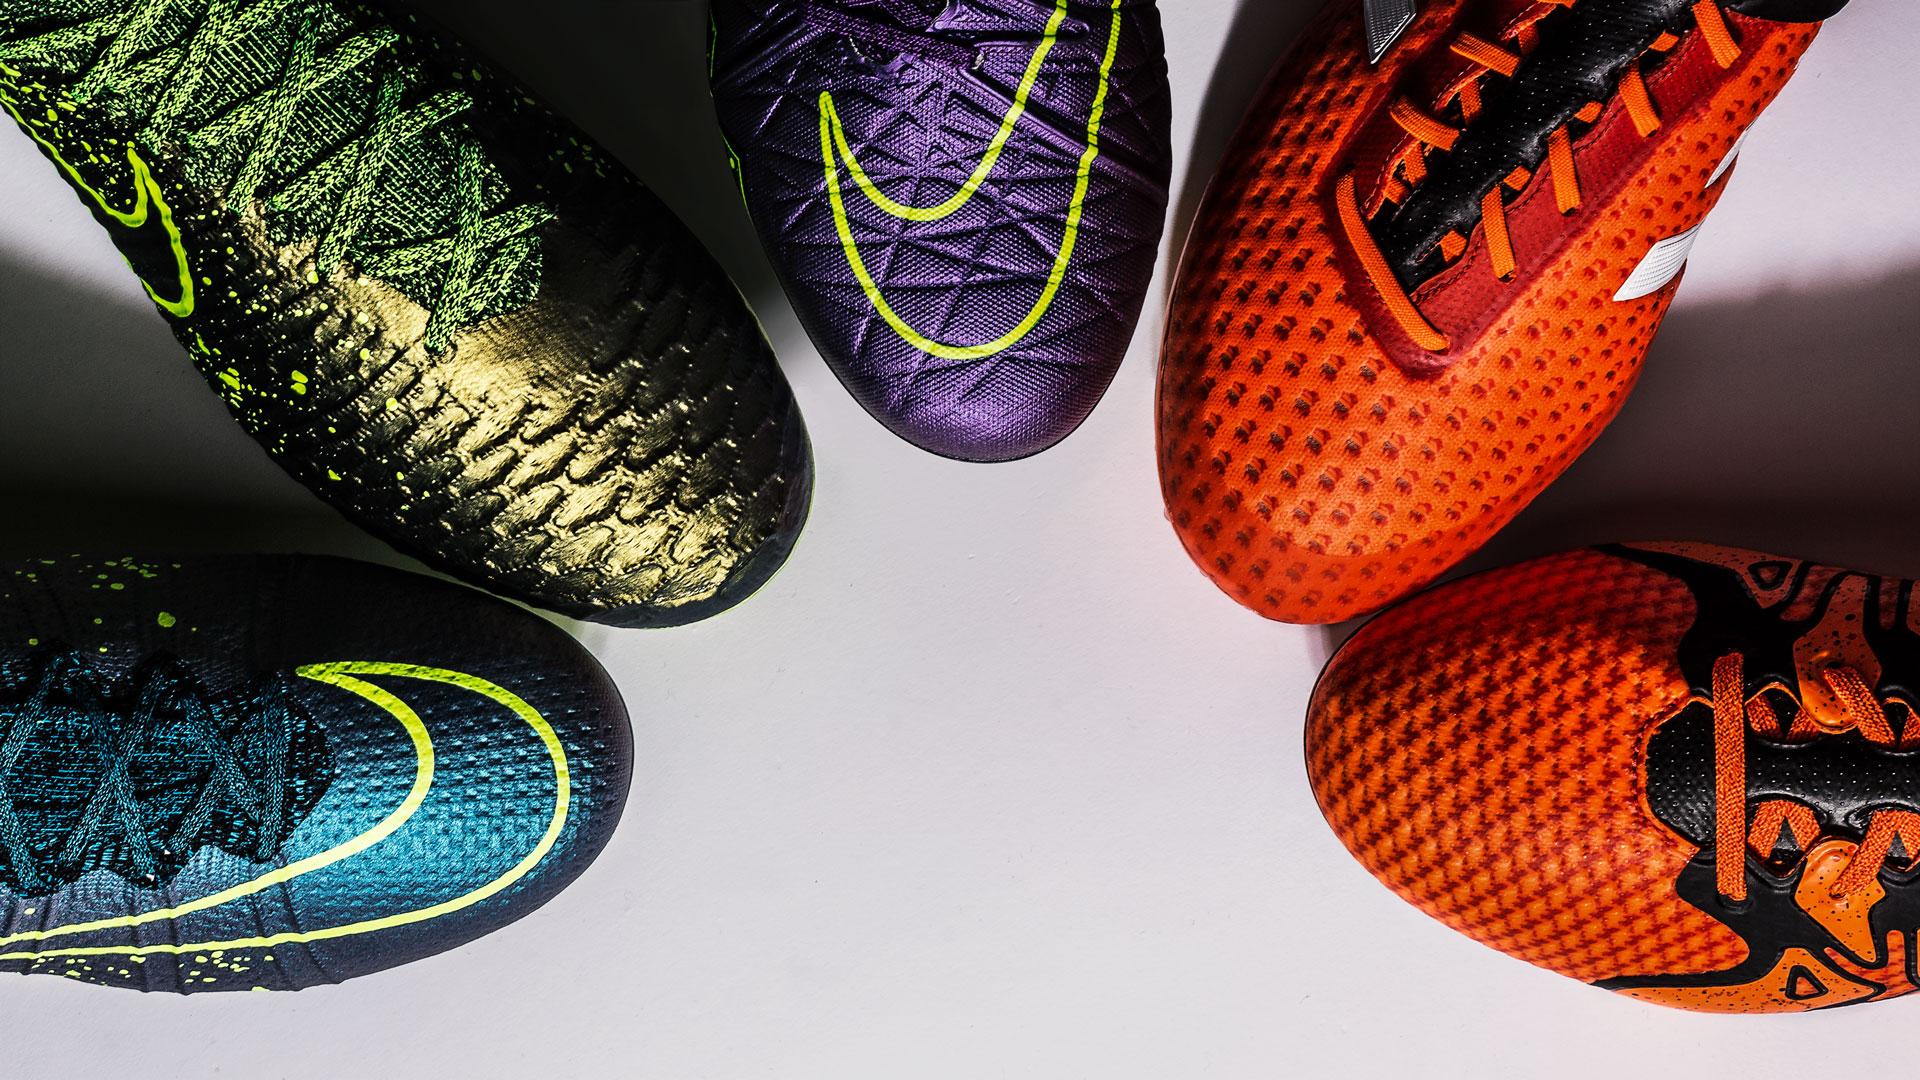 Nike Or Adidas Nike Or Adidas updated their profile